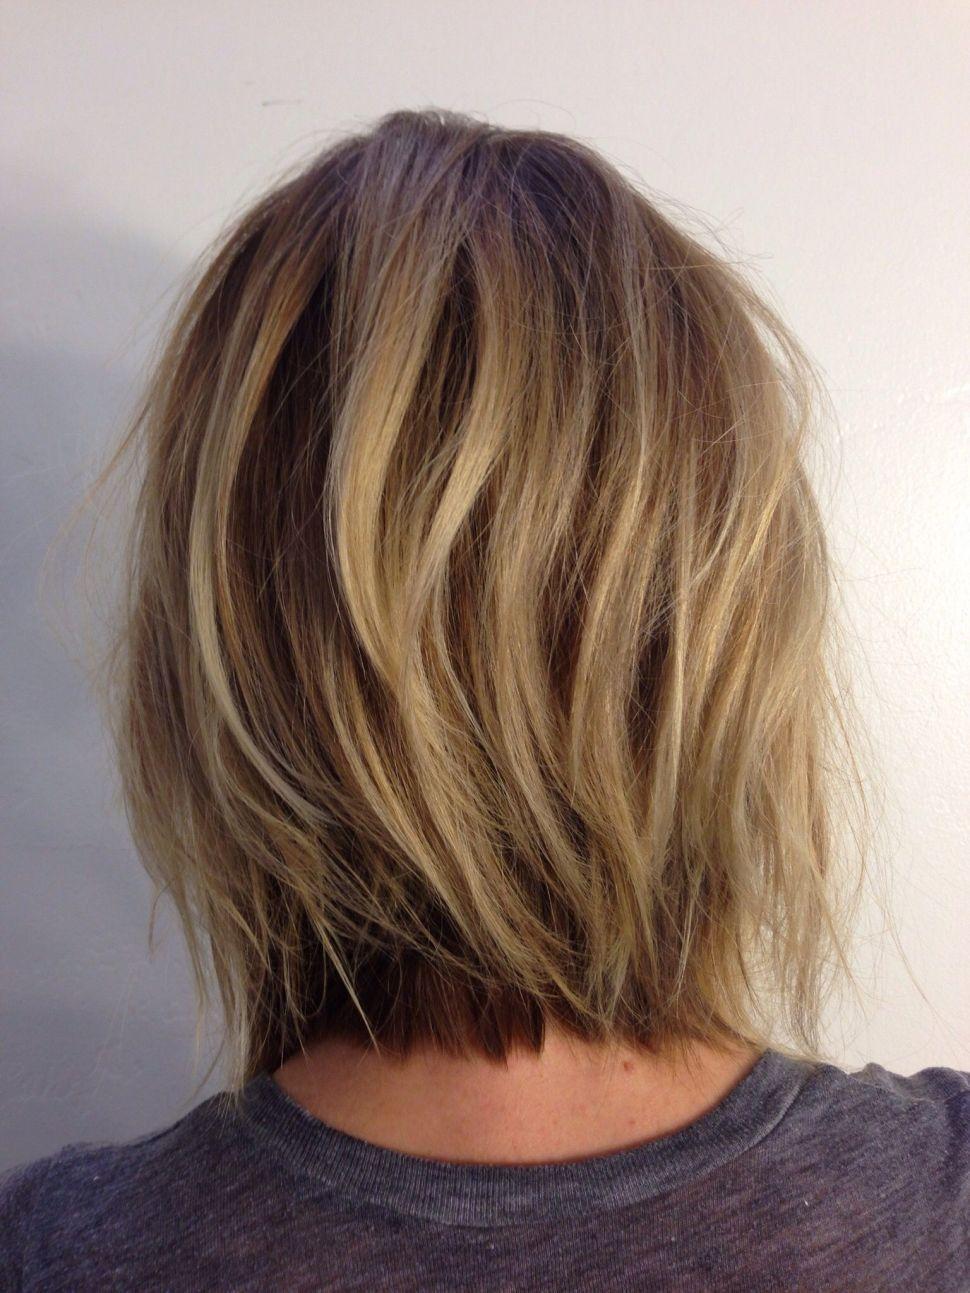 Pin On Hairstyles Ideas 2020